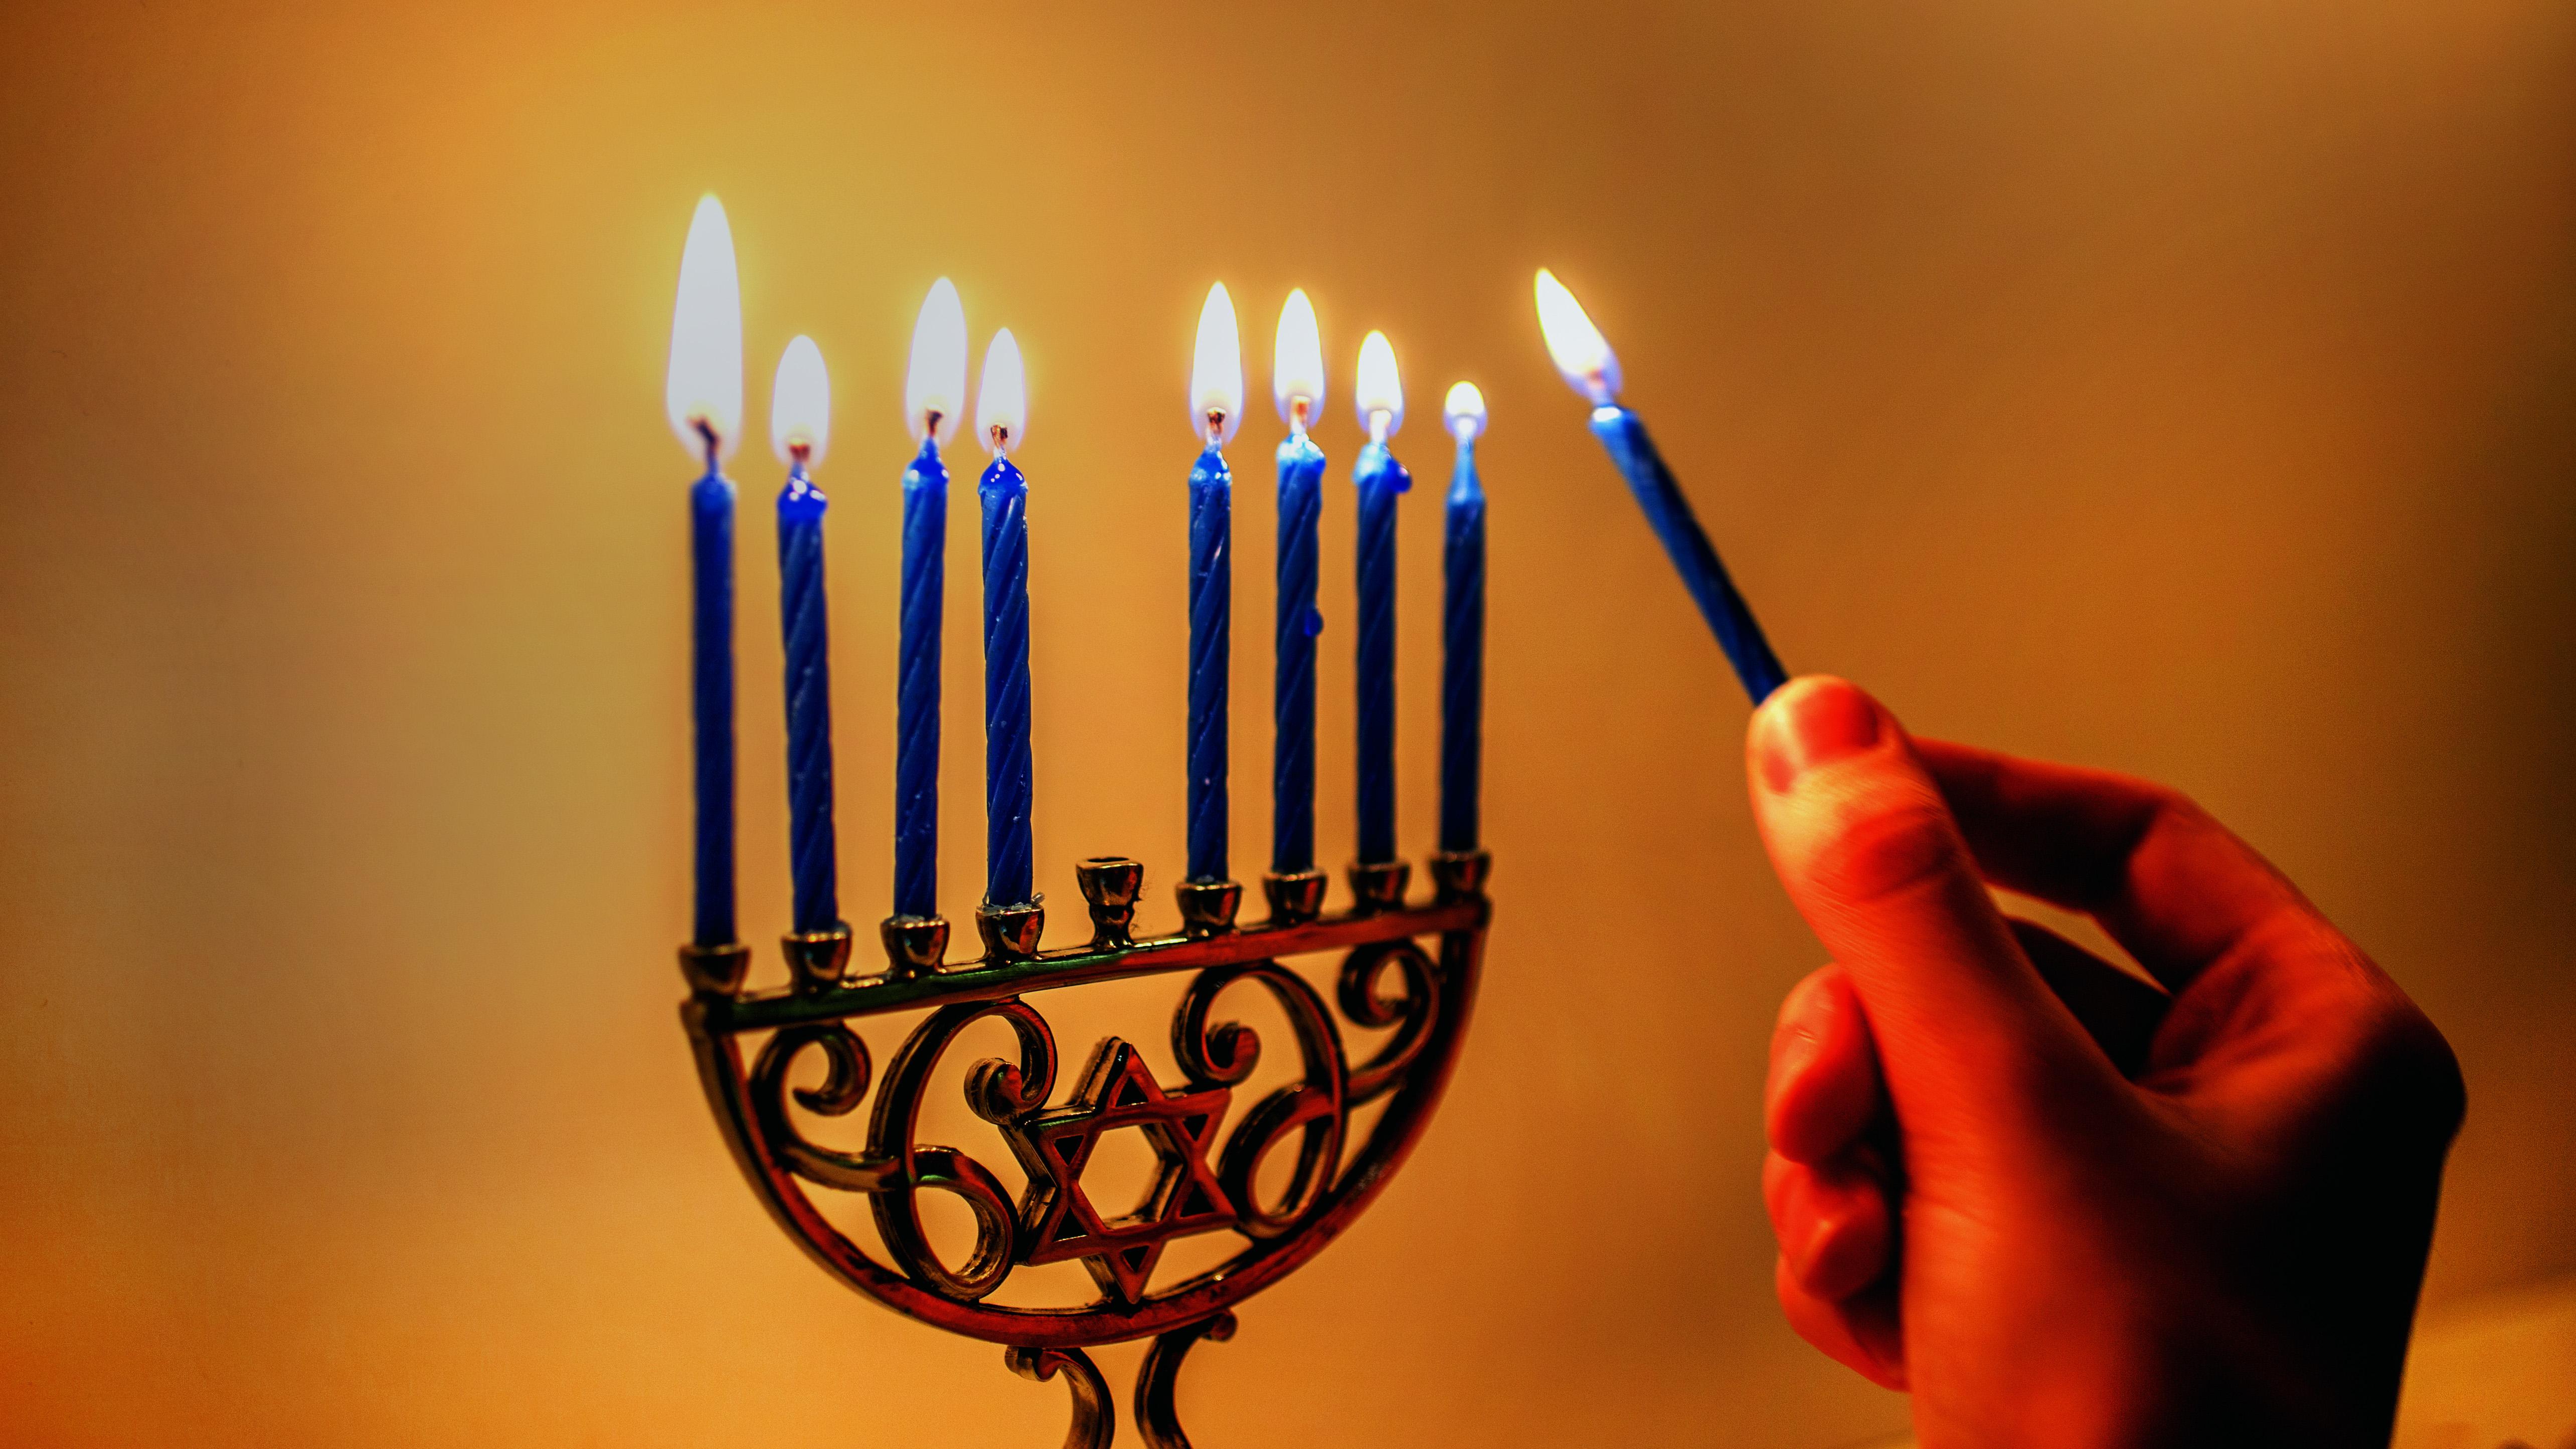 light holiday candle lighting chanukah hanukkah candelabrum macro photography menorah hanukkiyah & Free Images : light holiday candle lighting chanukah hanukkah ...